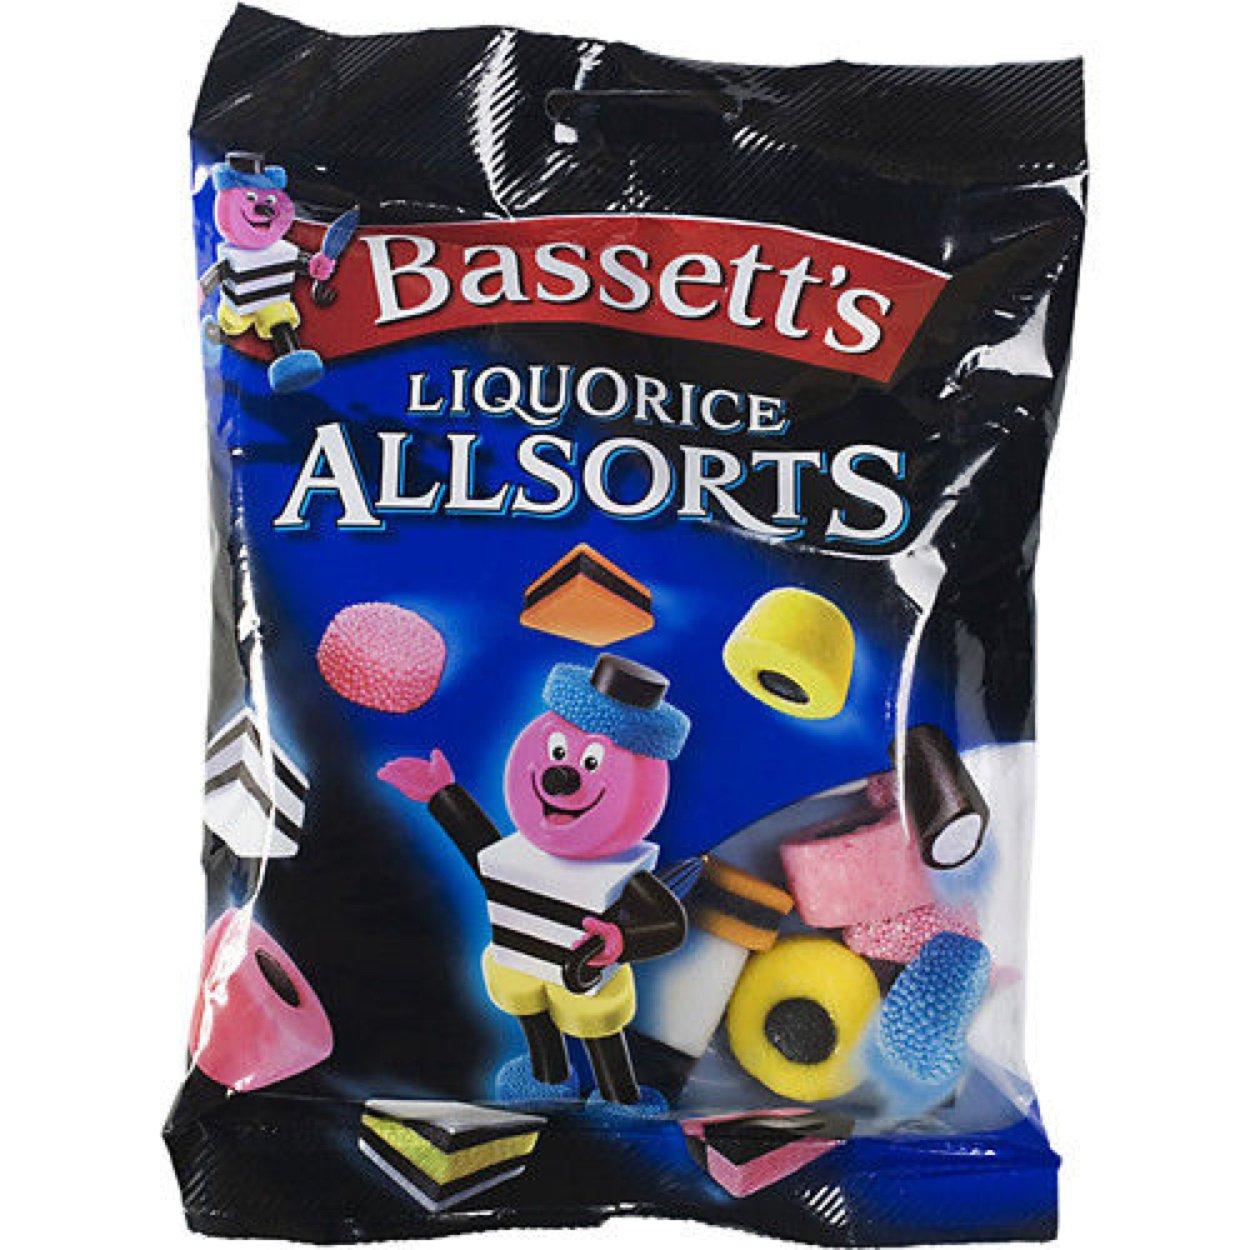 Bassett's The Original Liquorice Allsorts (215g Bag of Licorice)